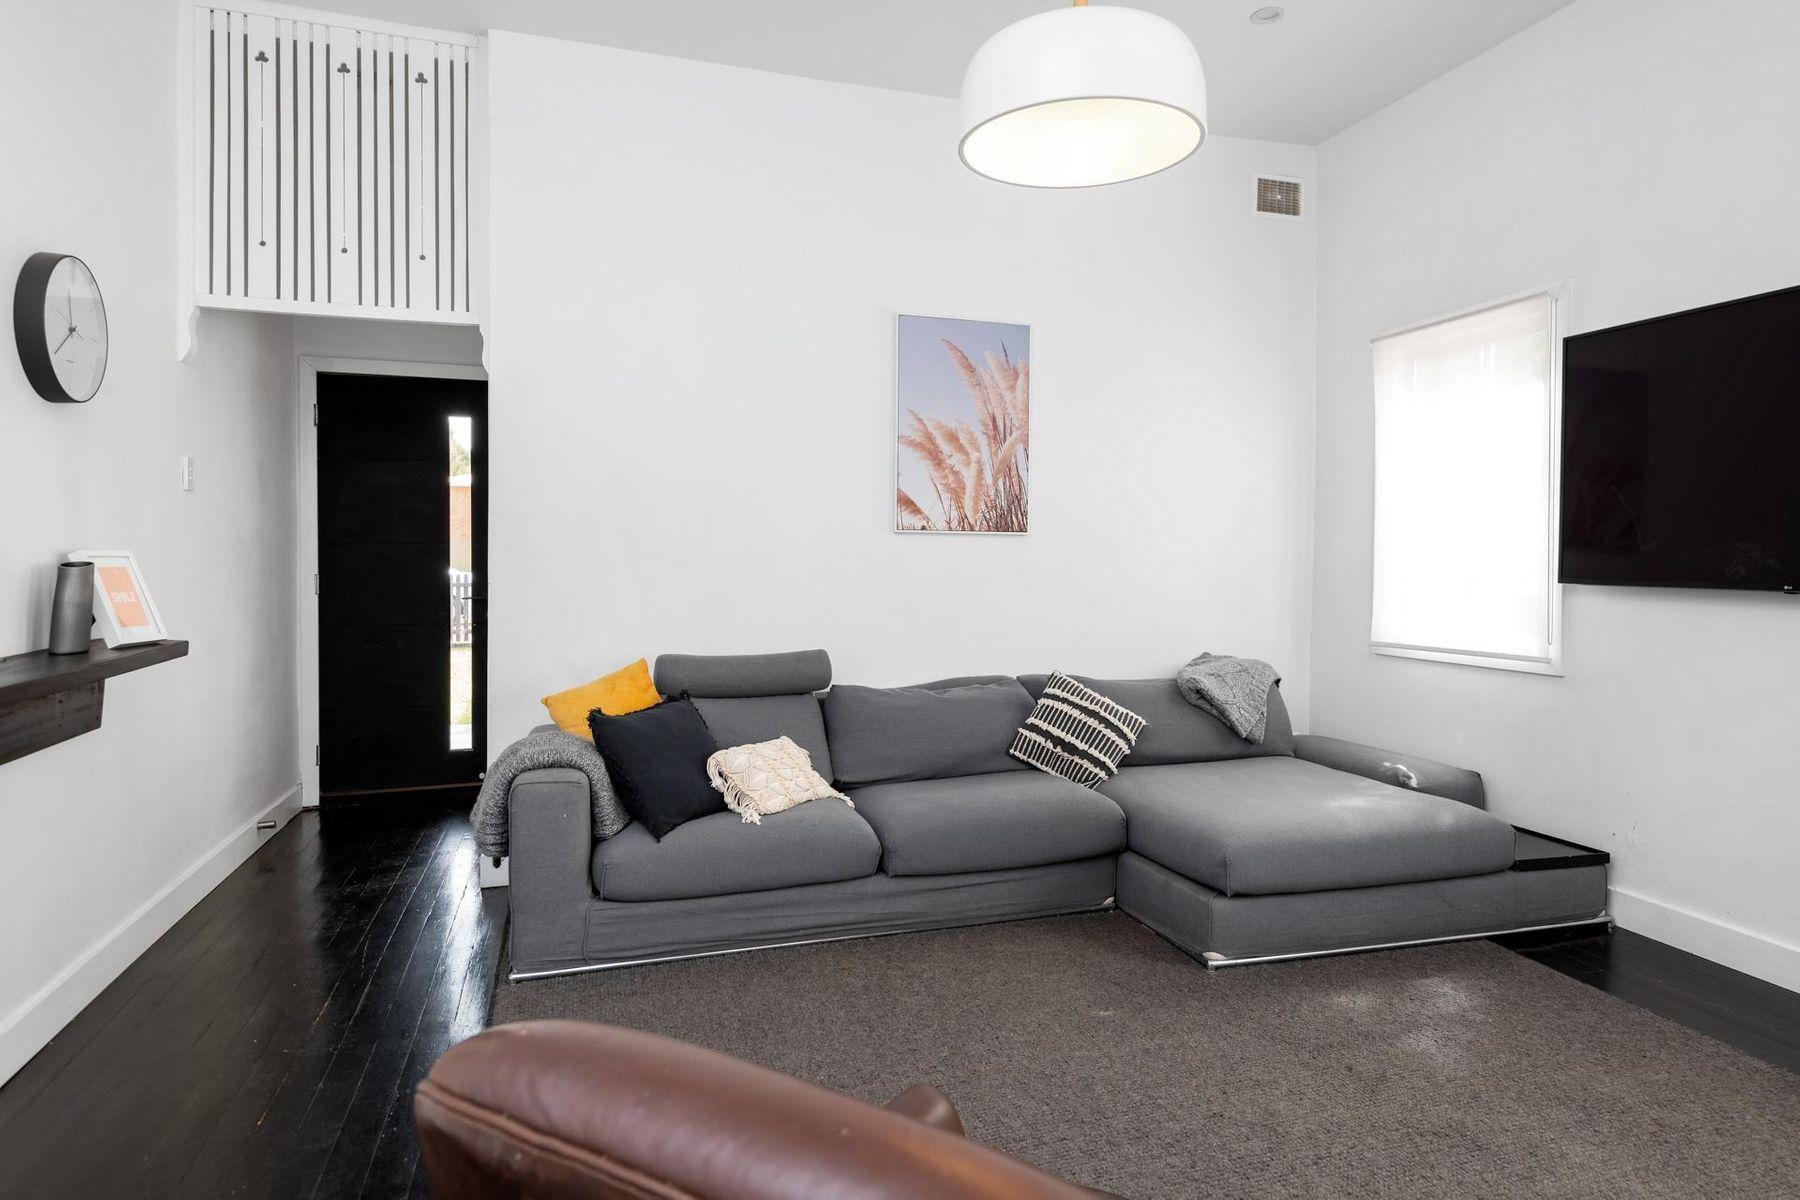 1/519 Hannan Street, Kalgoorlie, WA 6430